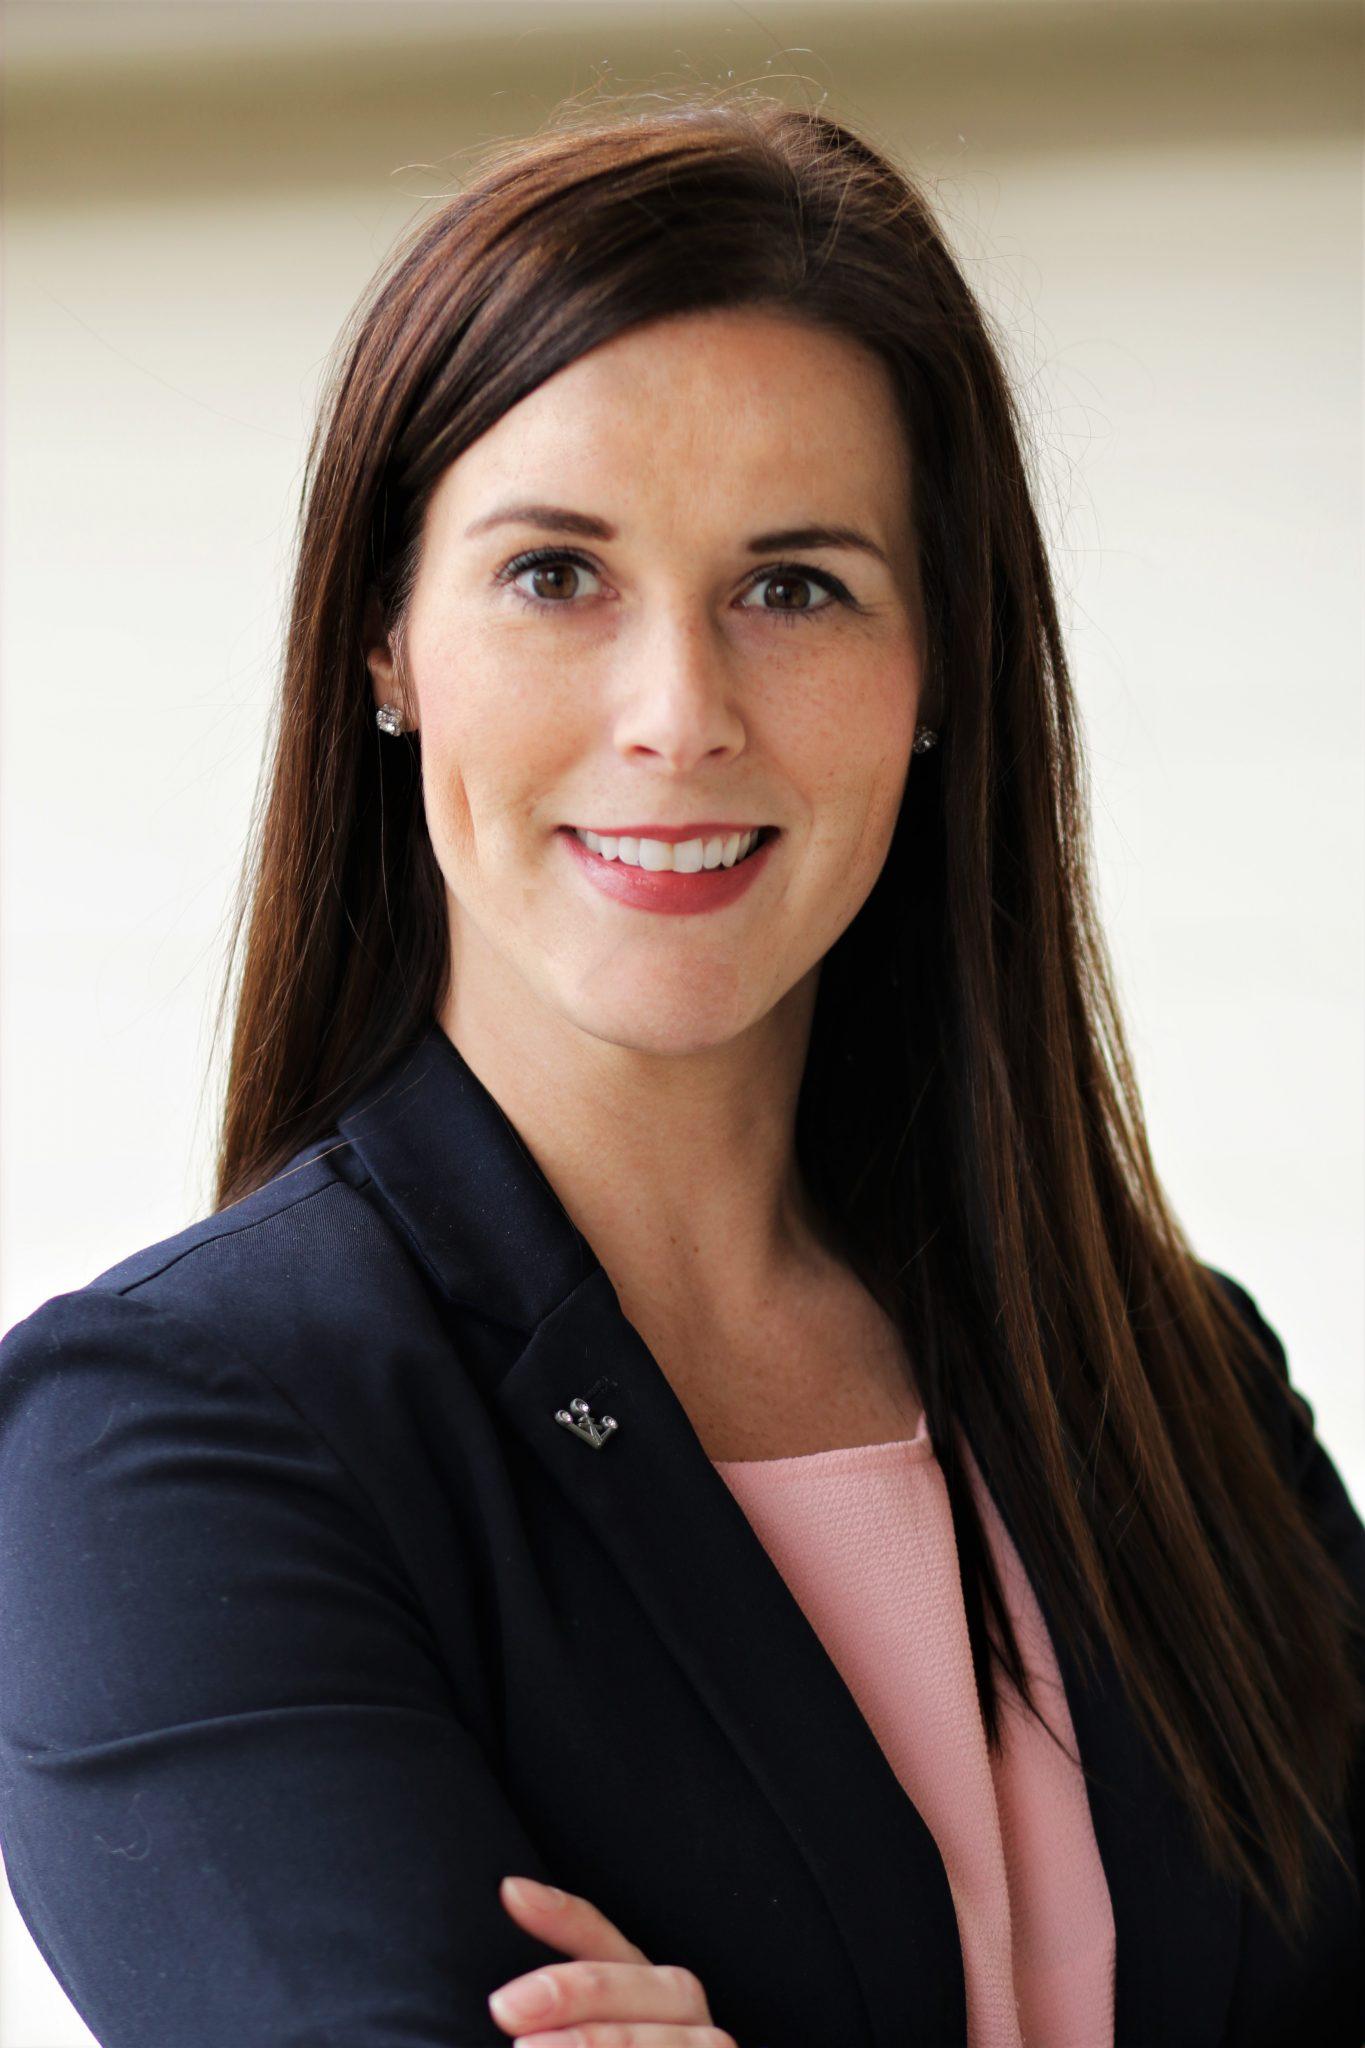 Kelly Karasek